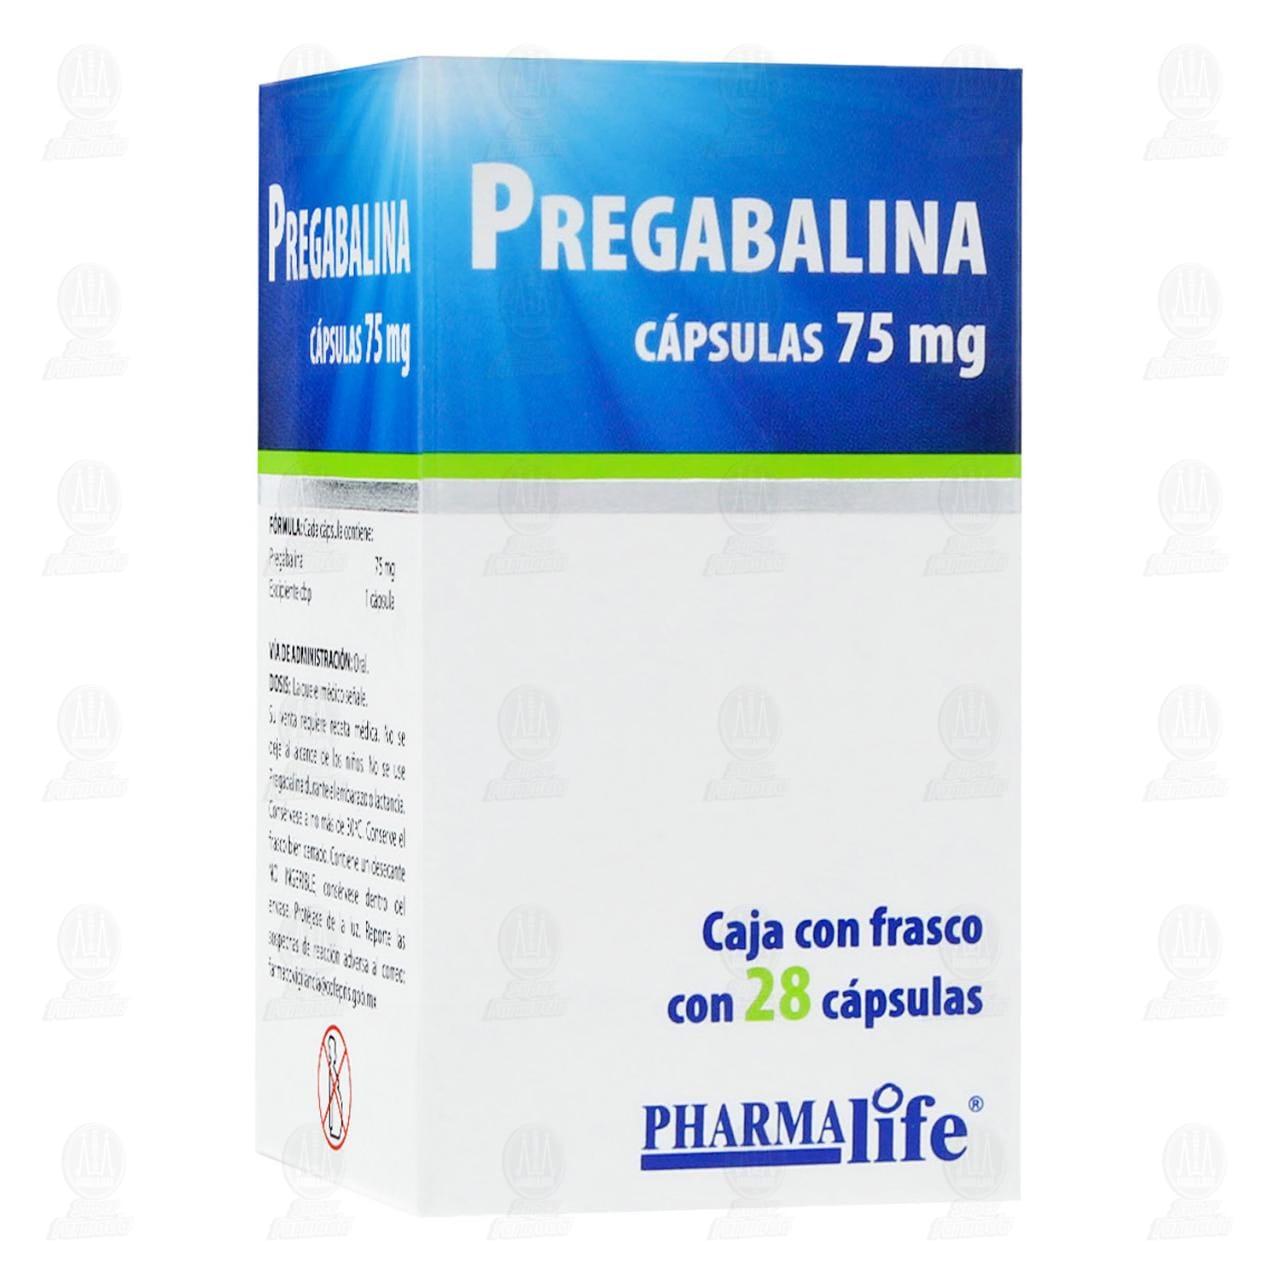 Comprar Pregabalina 75mg 28 Cápsulas Pharmalife en Farmacias Guadalajara